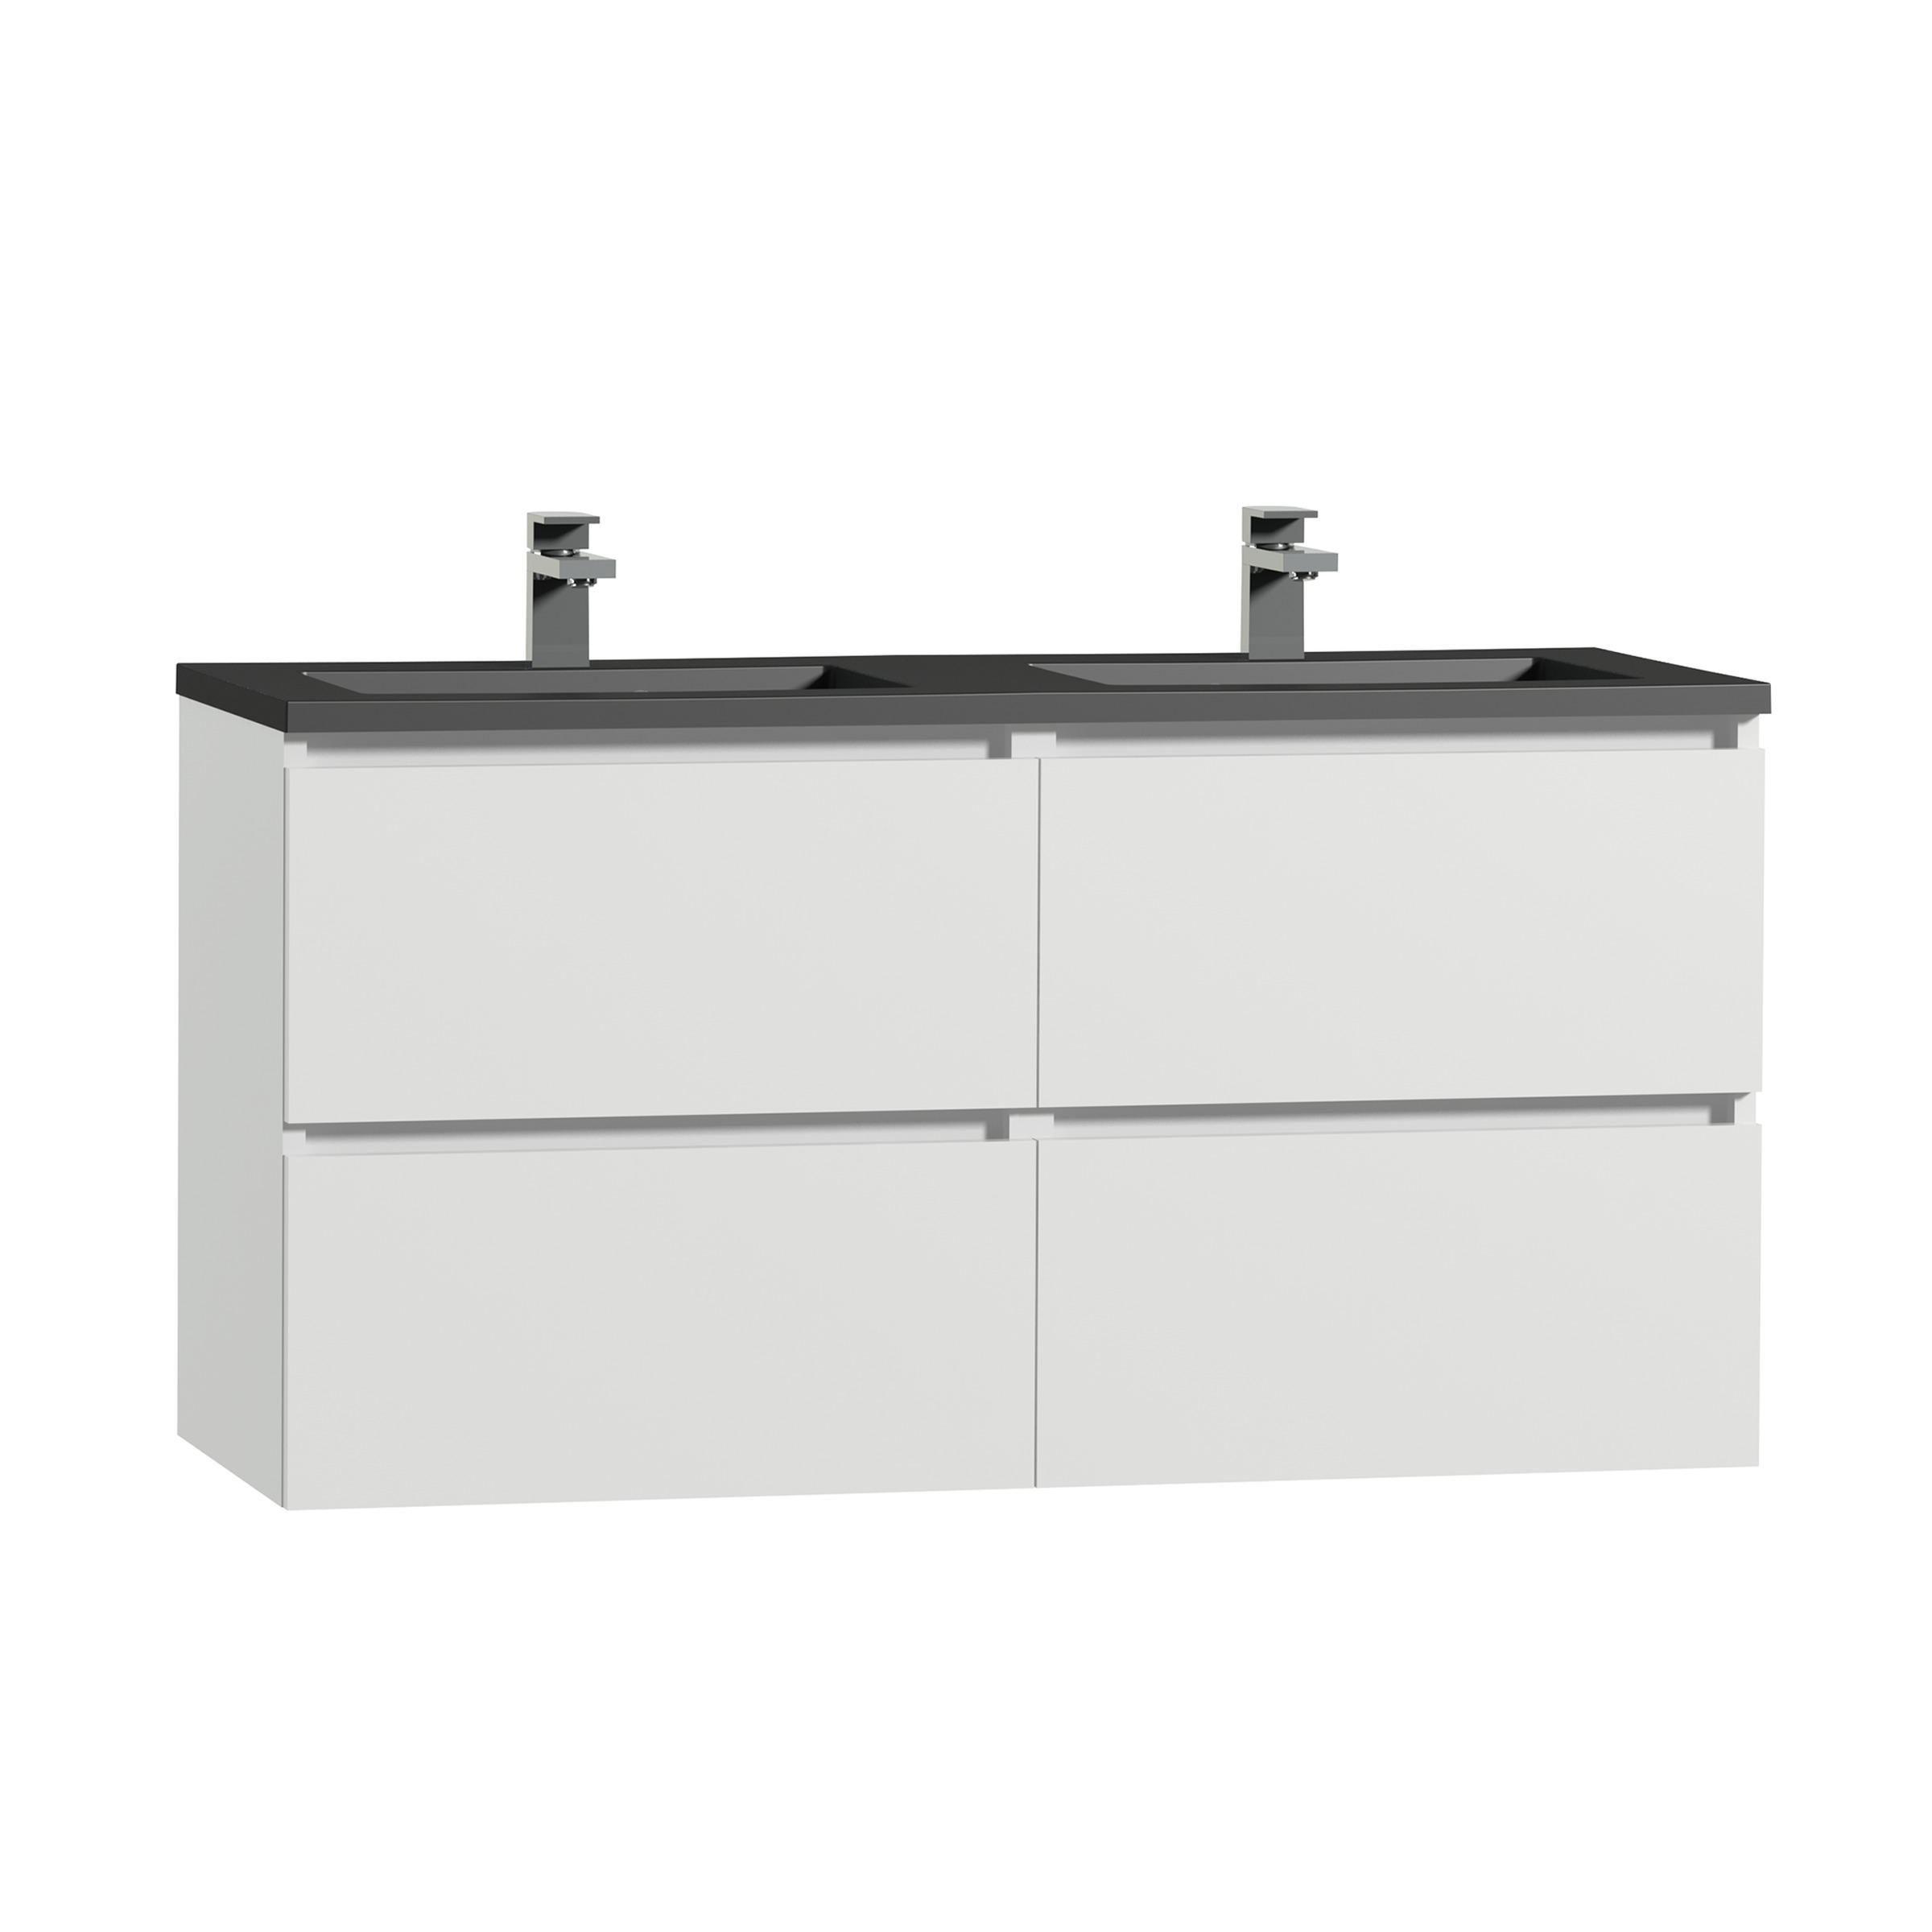 tiger karlo badkamermeubel 120 cm hoogglans wit met wastafel zwart